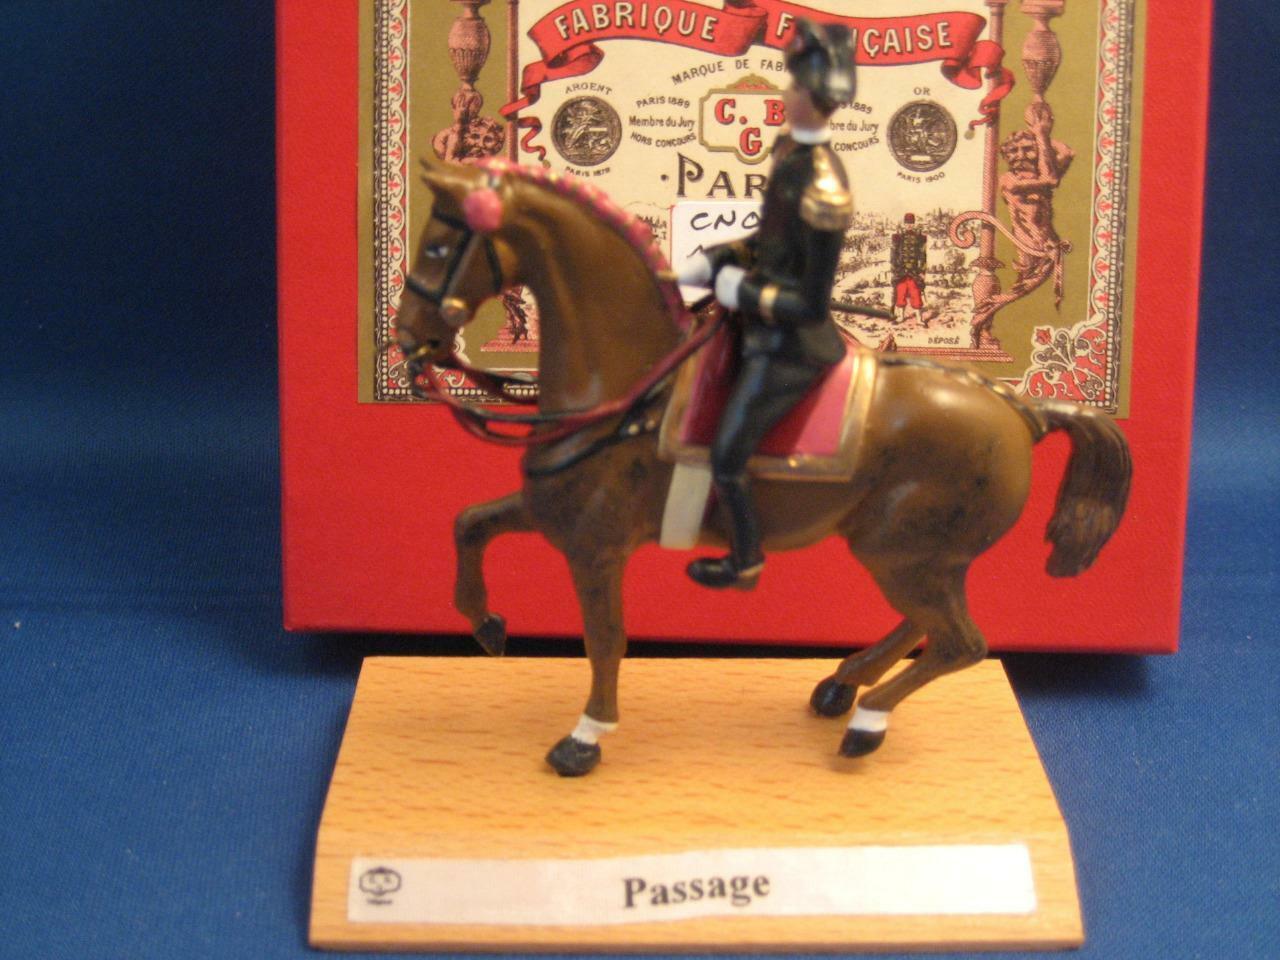 CBG Mignot RARE  CN05 Saumur Riding School Dressage  Passage  - Mint in the Box